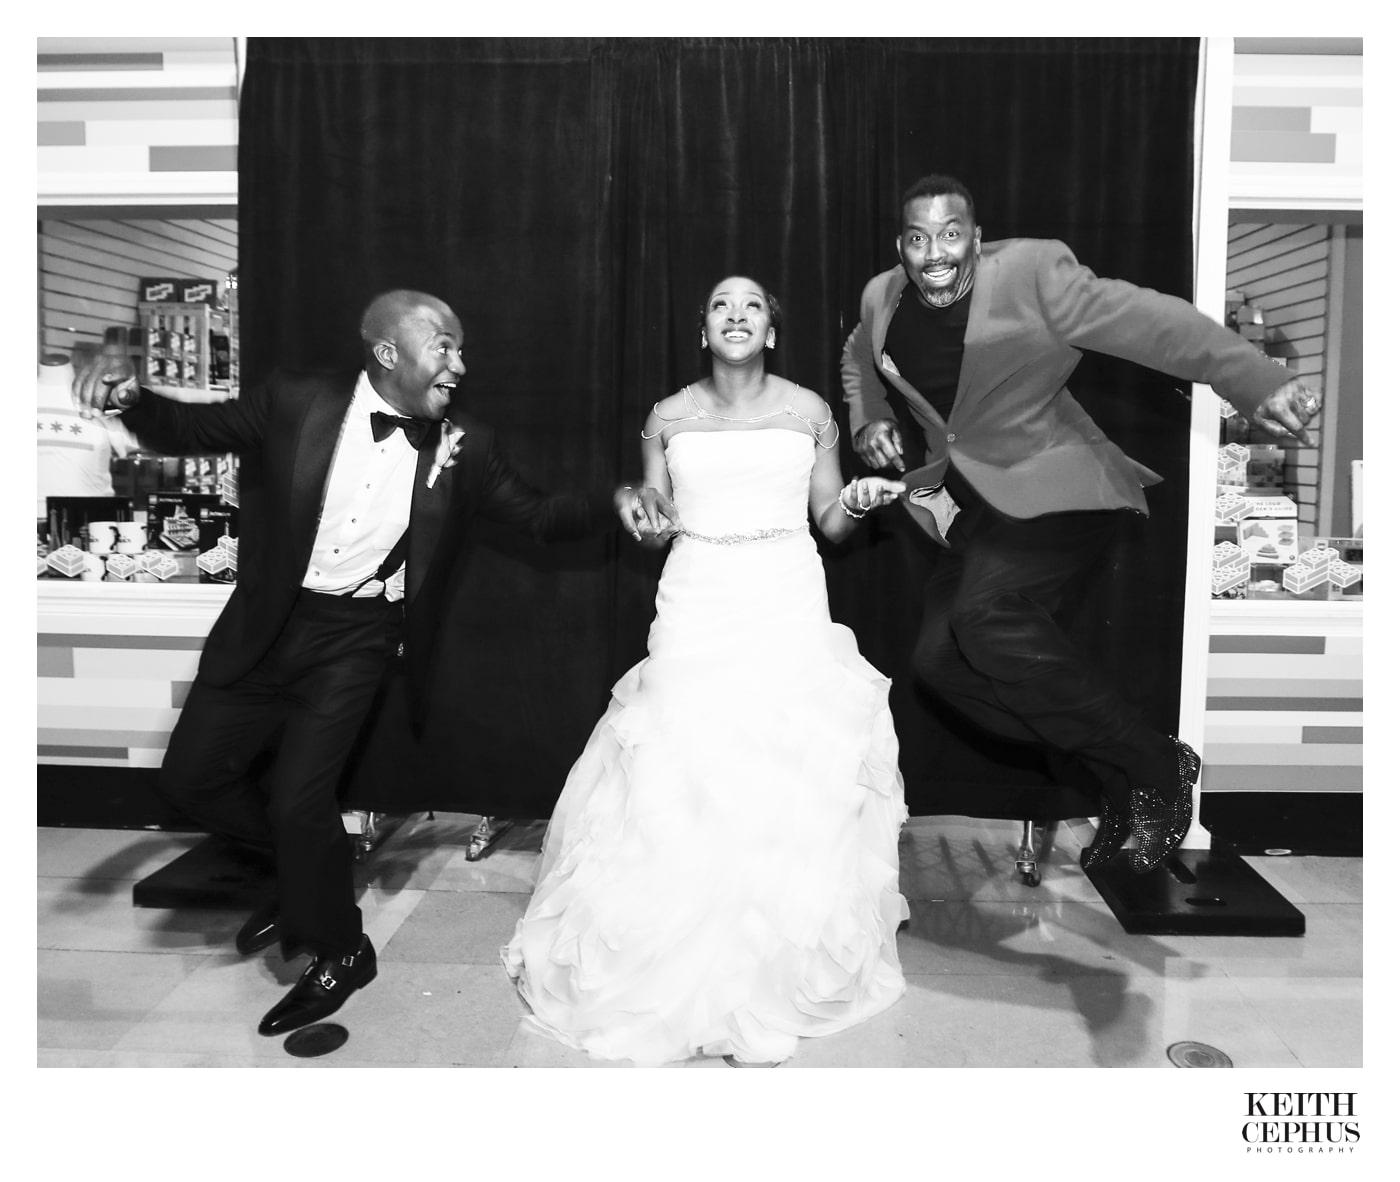 Museum of Science and Industry Wedding Photographer   Chicago Wedding Photographer   Rockefeller Chapel   Lauren and Kyle's Amazing Wedding!